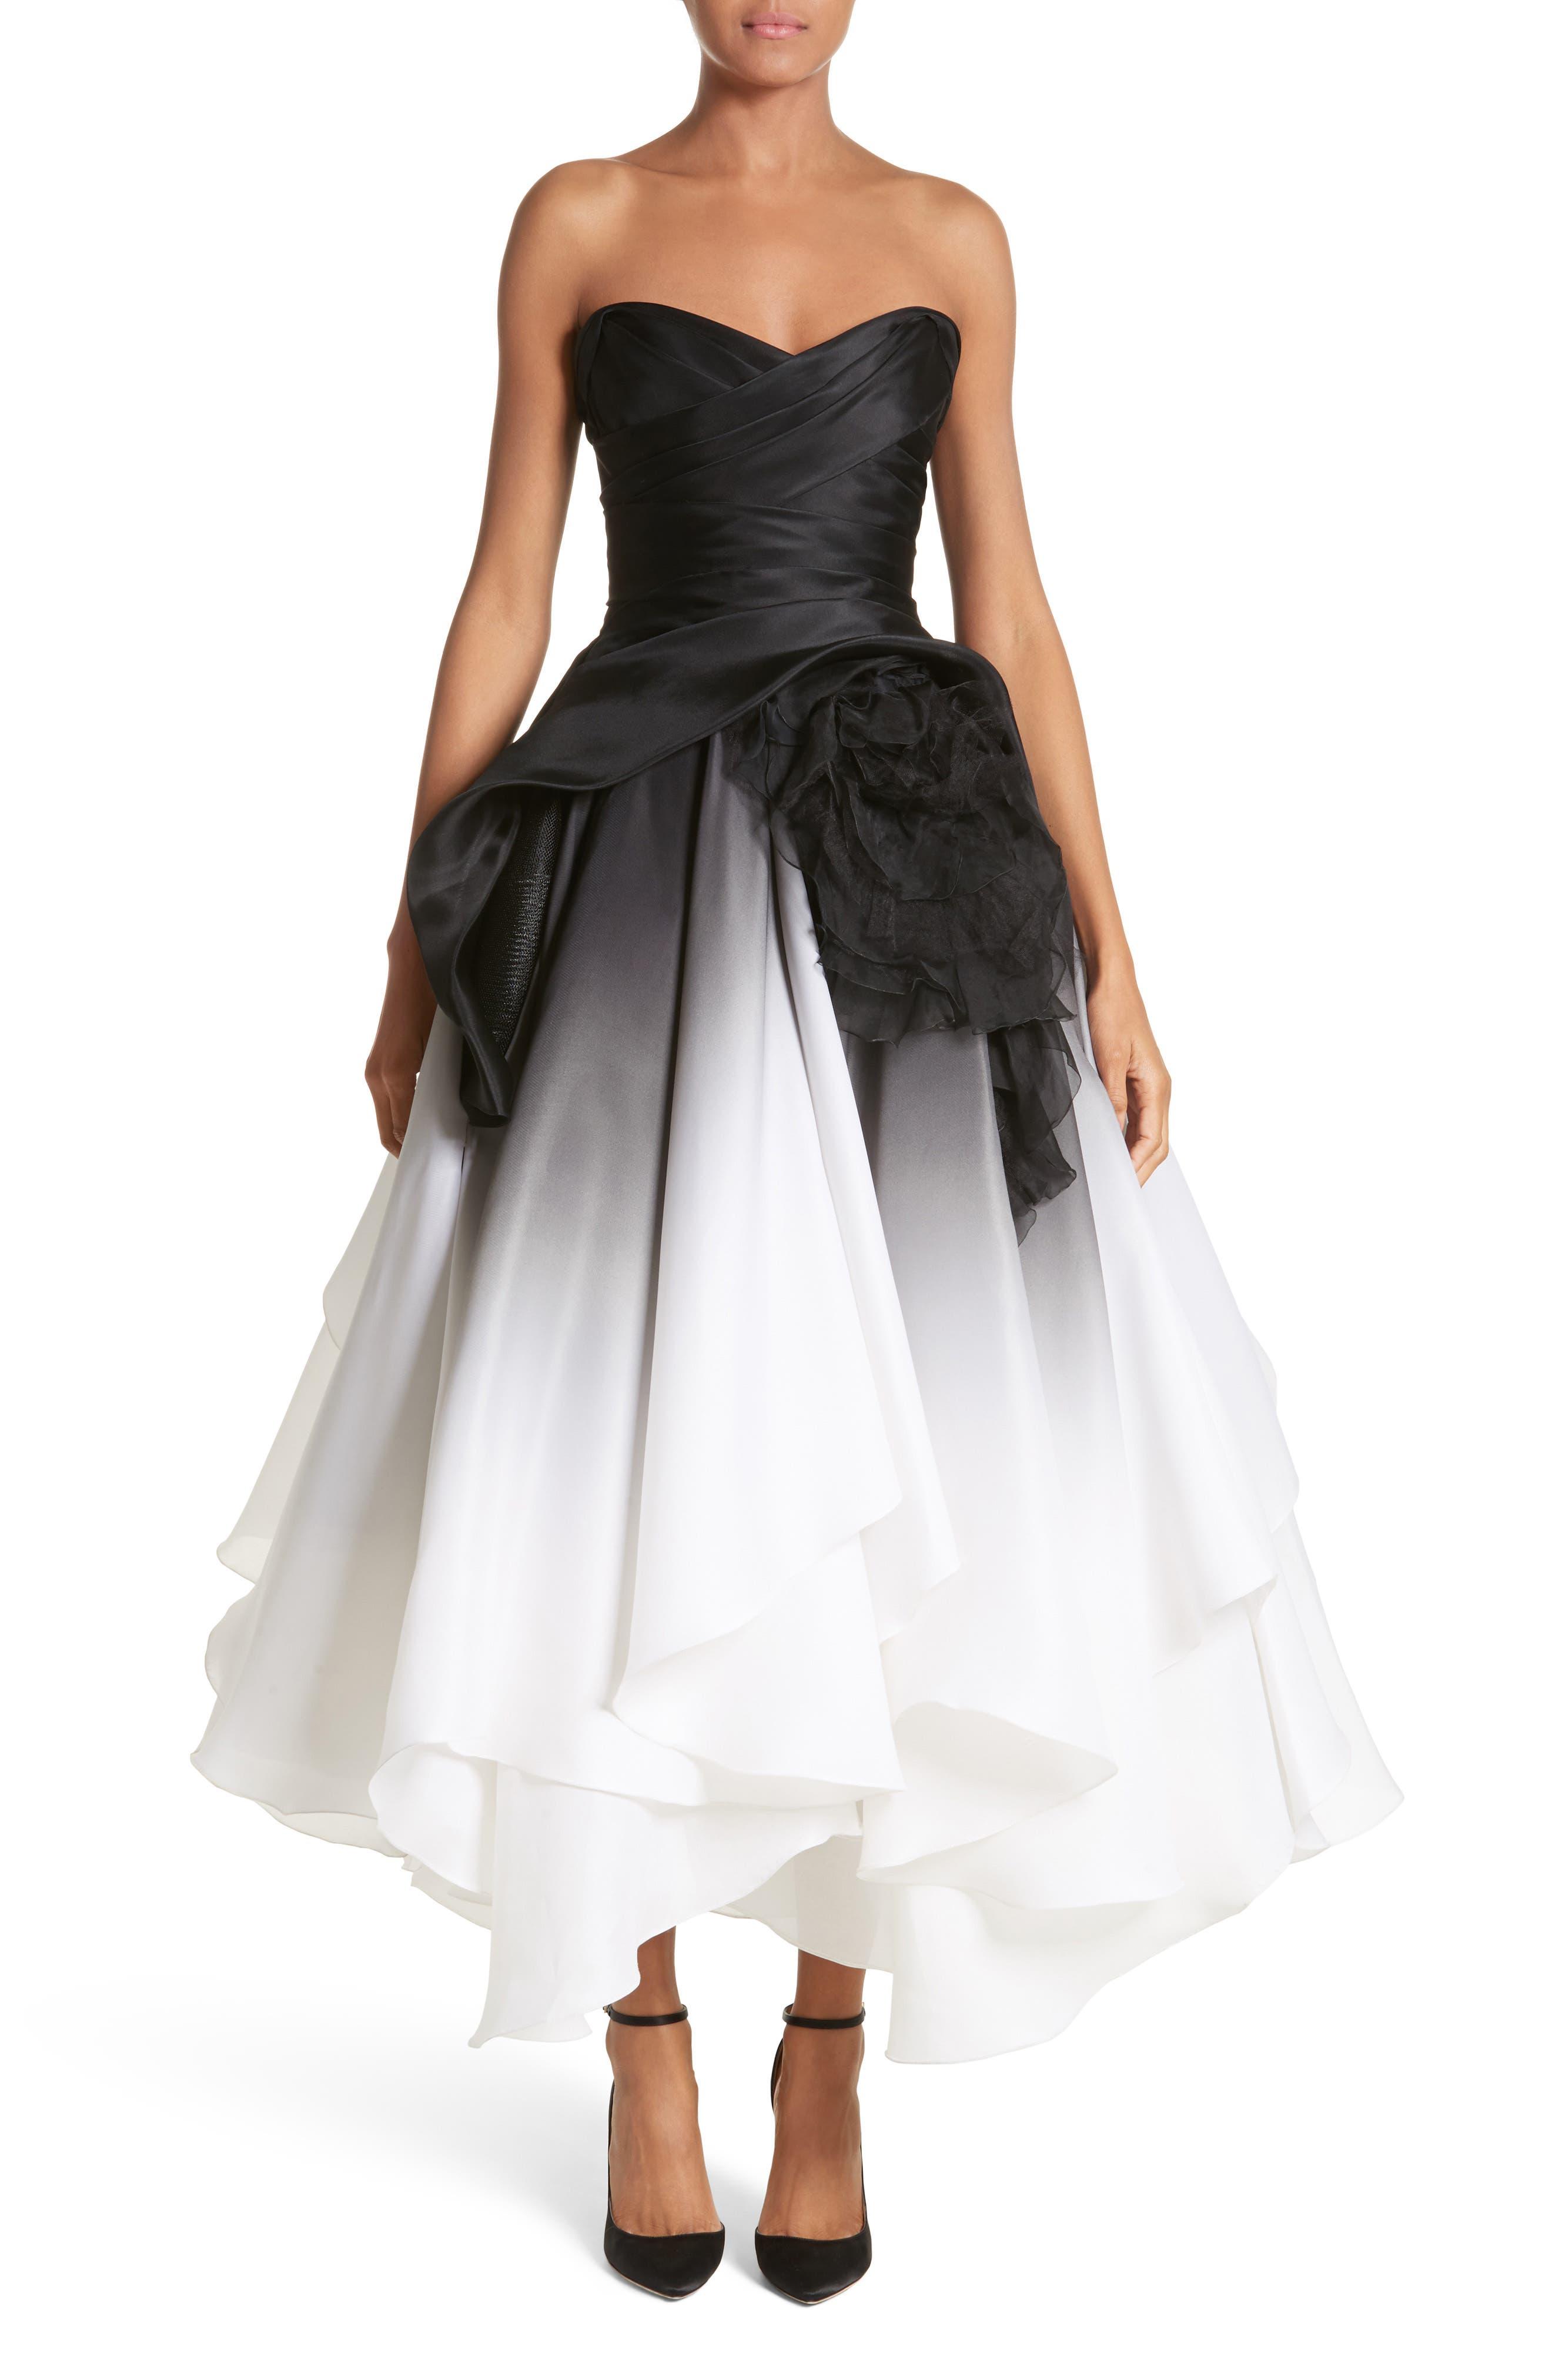 Ombré Strapless Tea Length Dress,                         Main,                         color, Black/ White